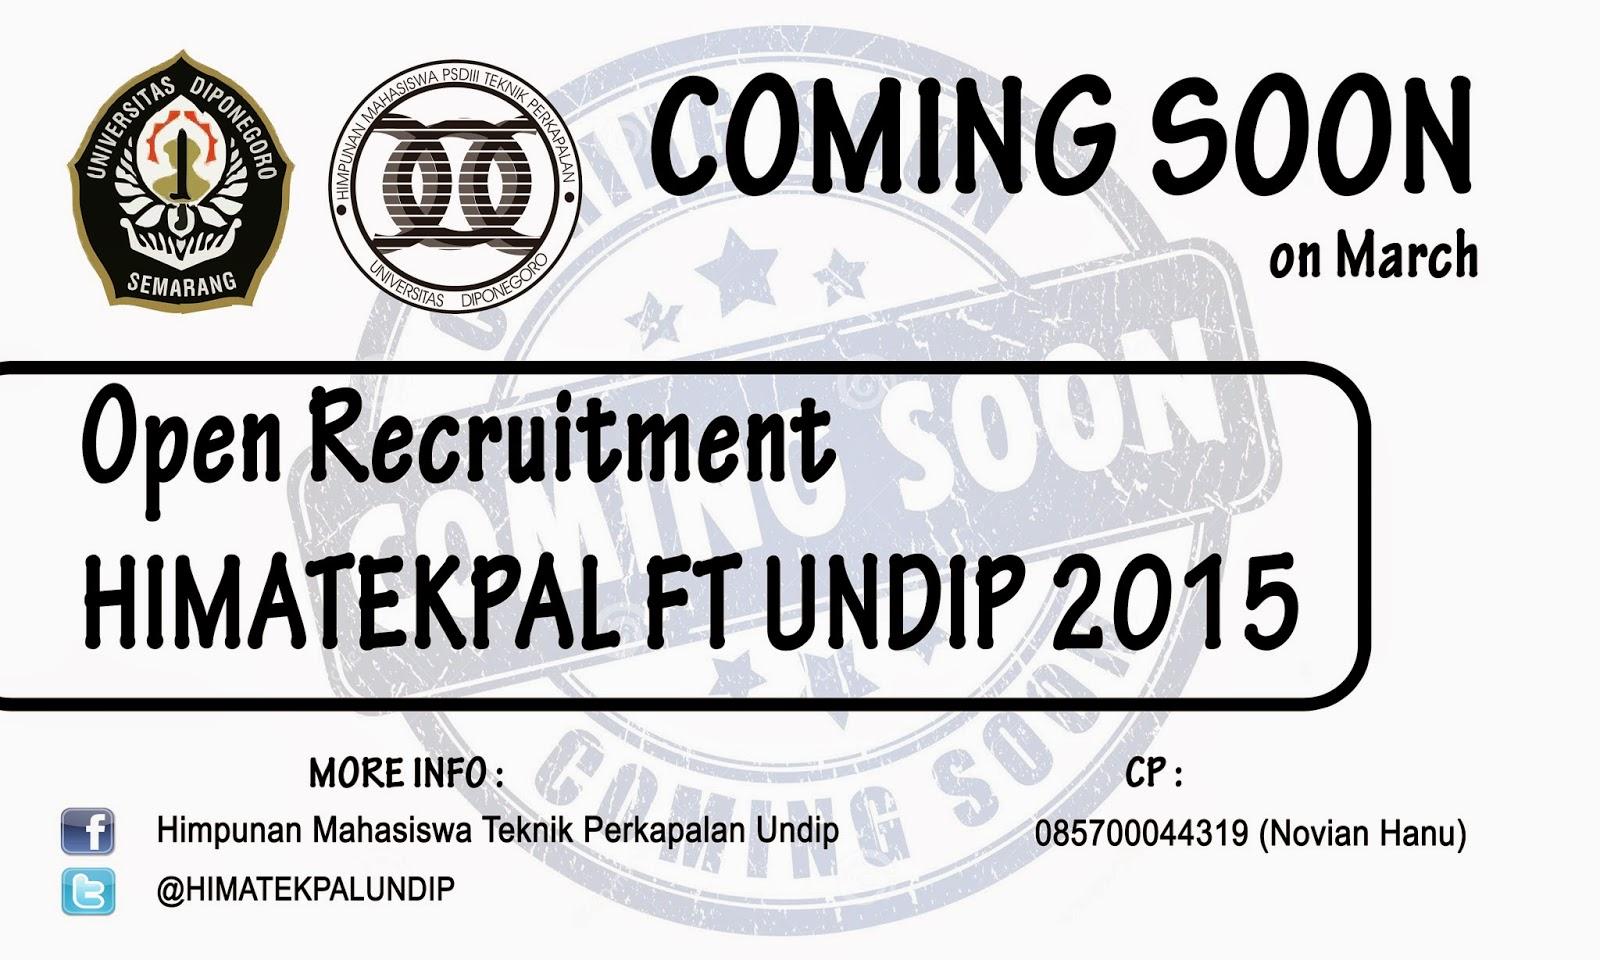 Open Recruitment HIMATEKPAL UNDIP 2015